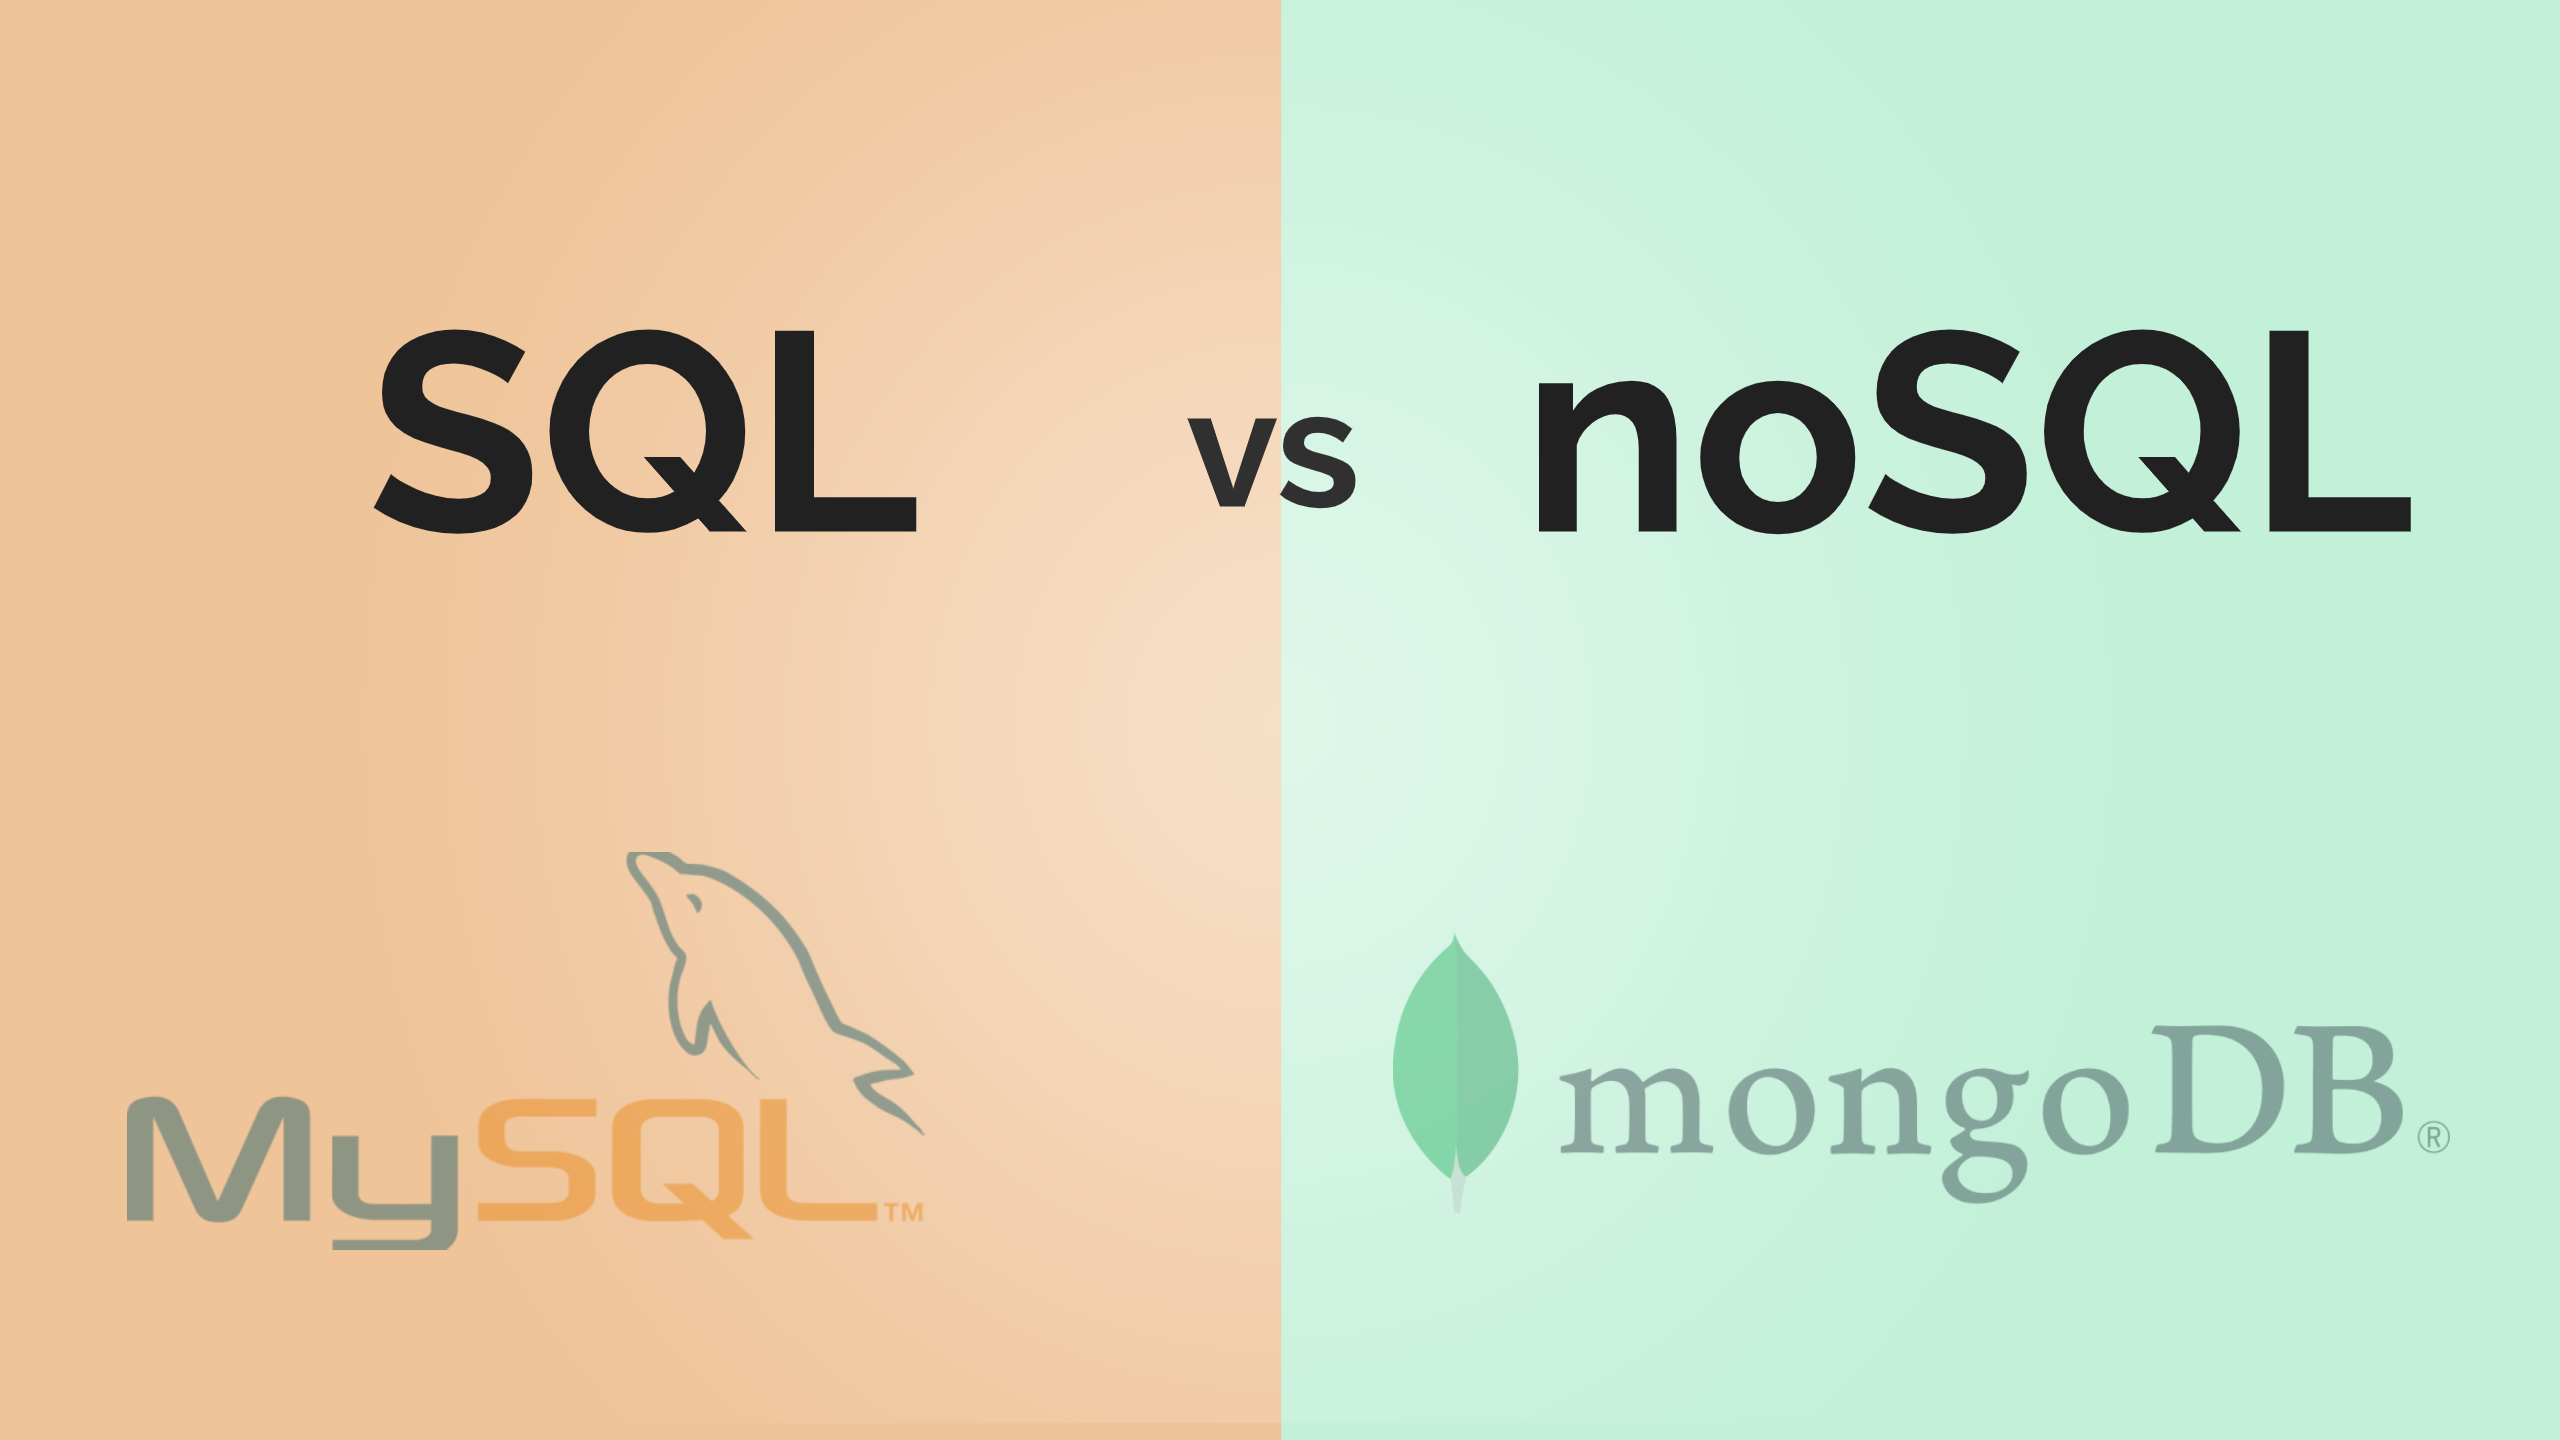 SQL vs noSQL | MySQL vs MongoDB - różnice